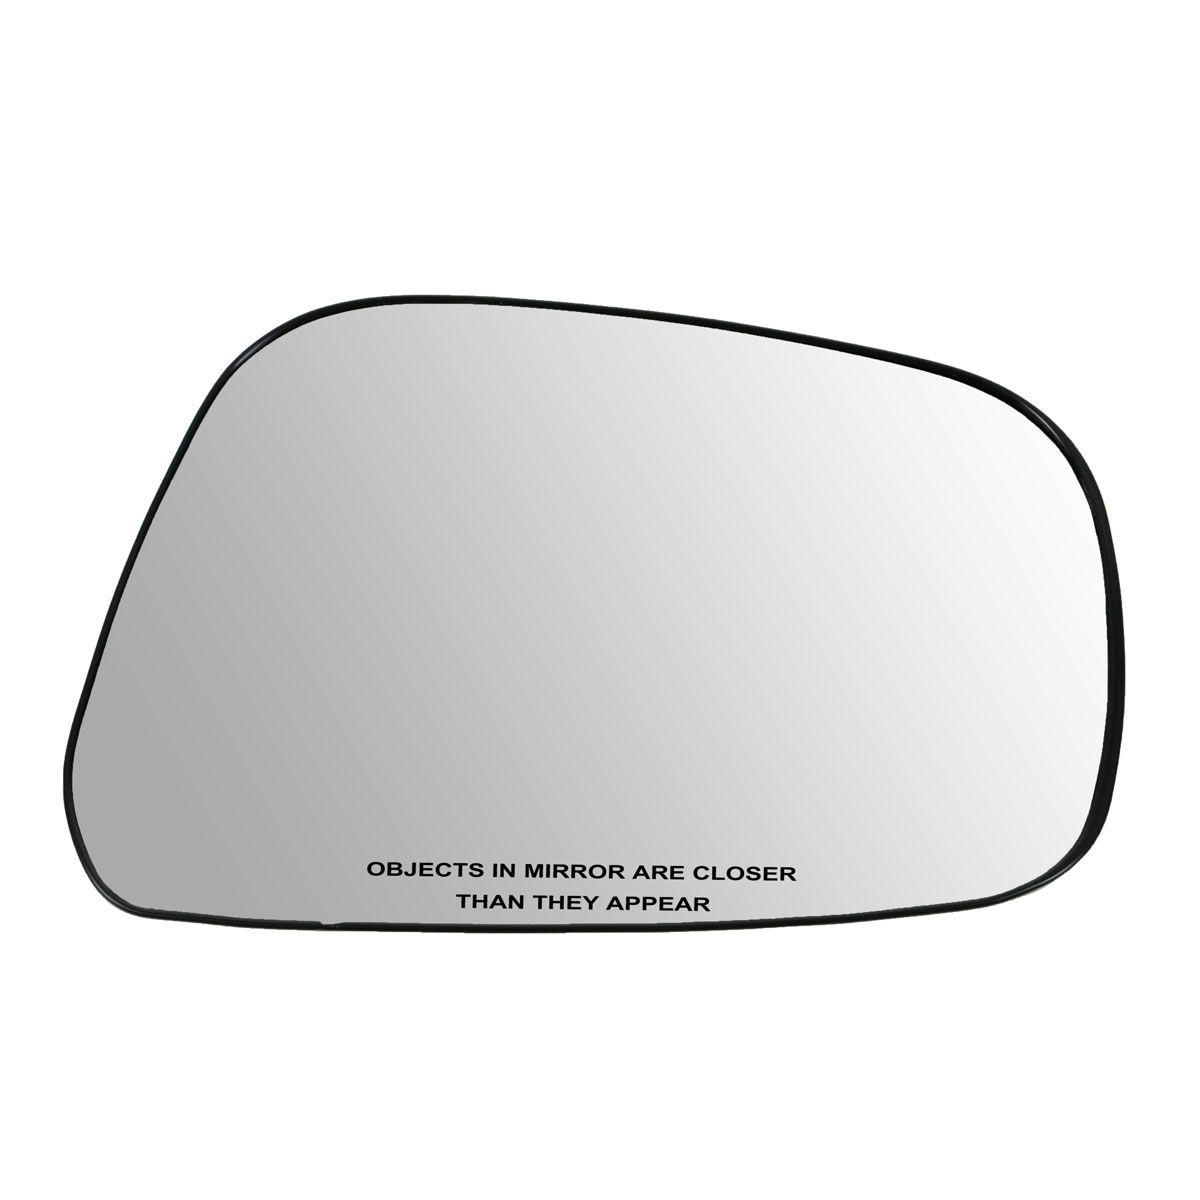 AM Right Passenger Side DOOR MIRROR PLATE For Nissan Xterra,Pathfinder,Frontier